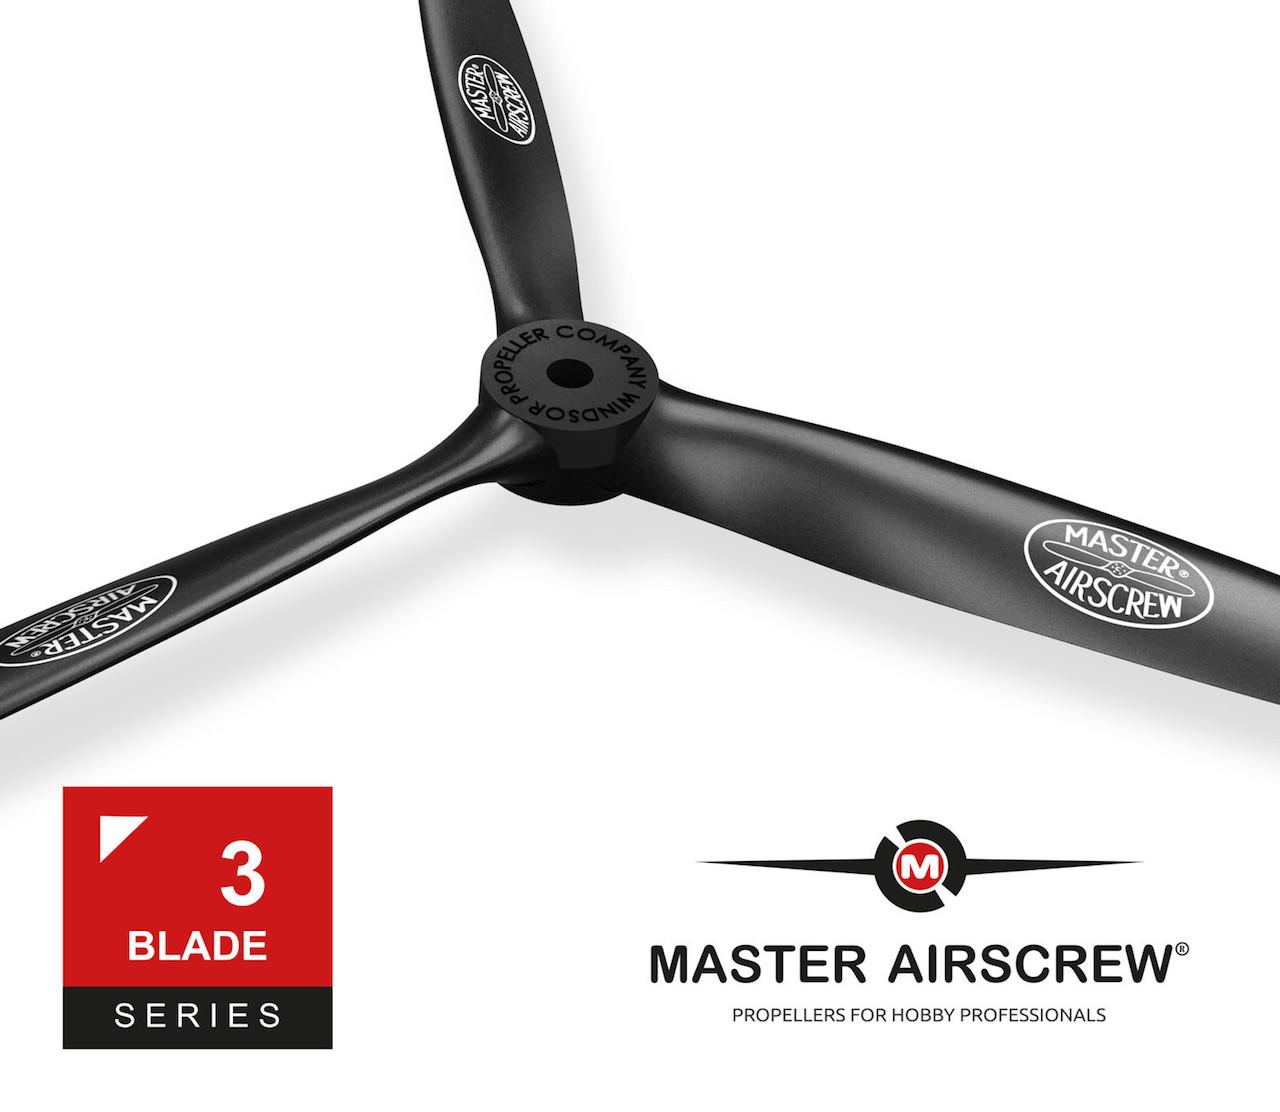 Master Airscrew 3-Blade Series